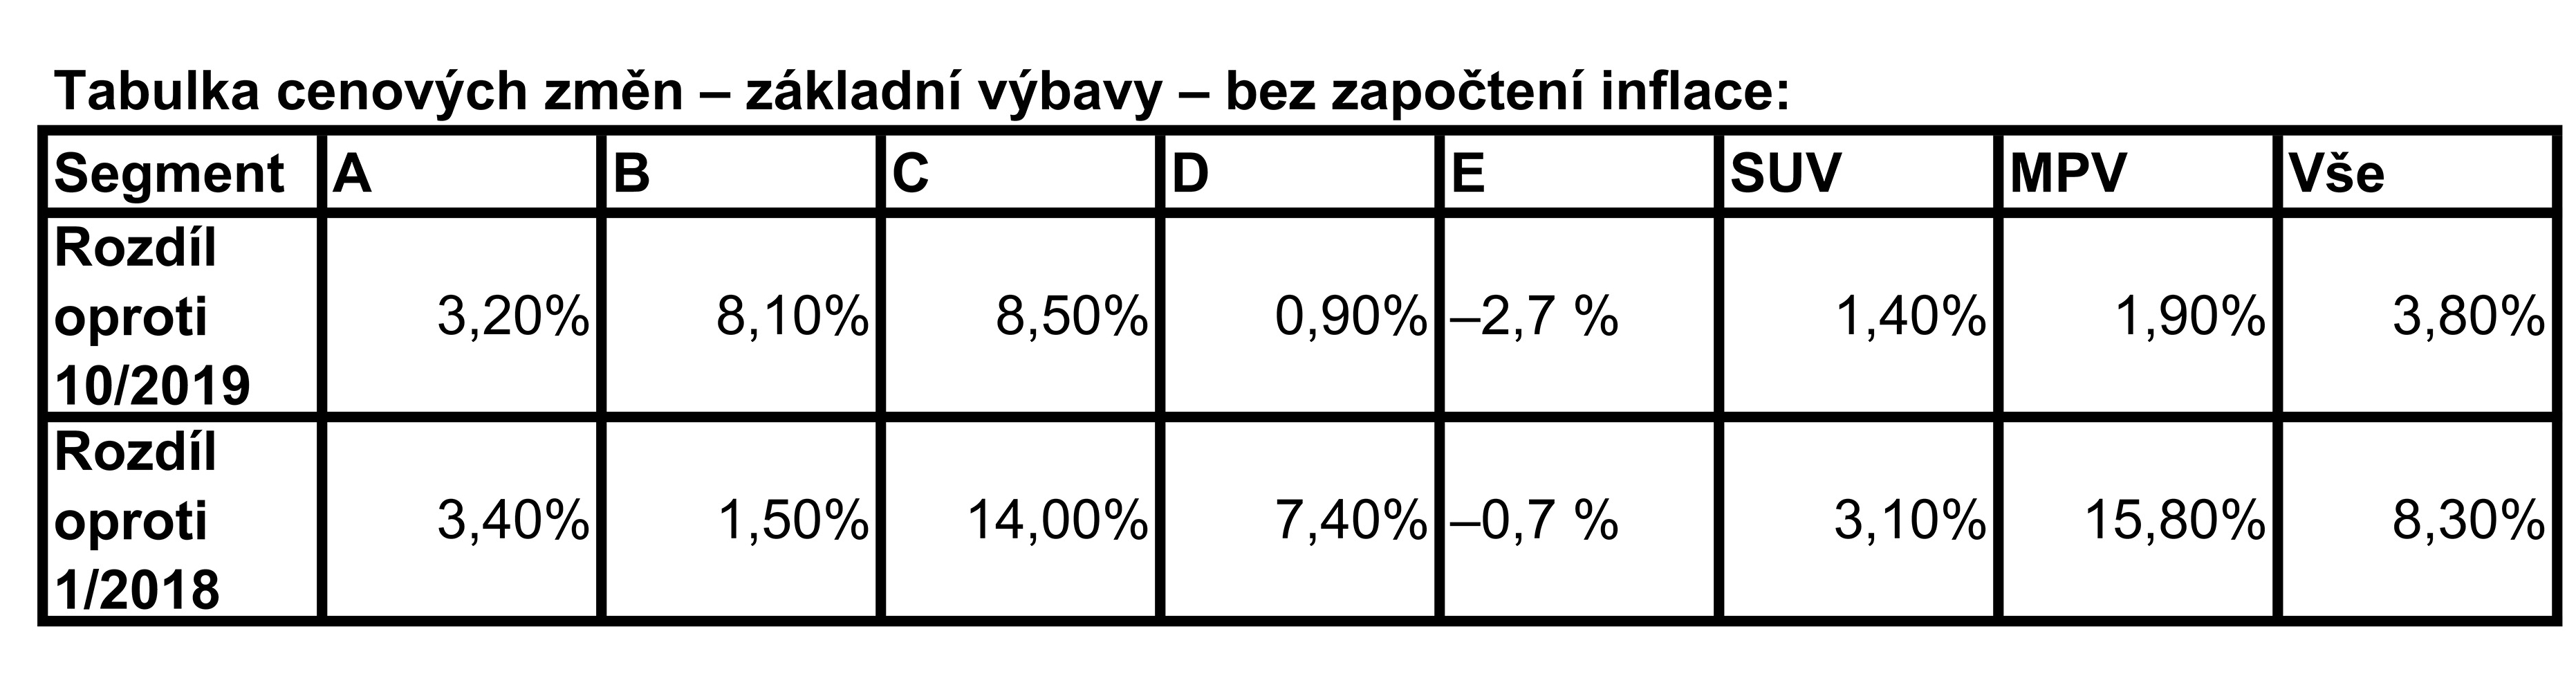 ey-tabulka-1-cenovy-index-ey-vice-nez-polovina-automobil-na-trhu-zdrazila